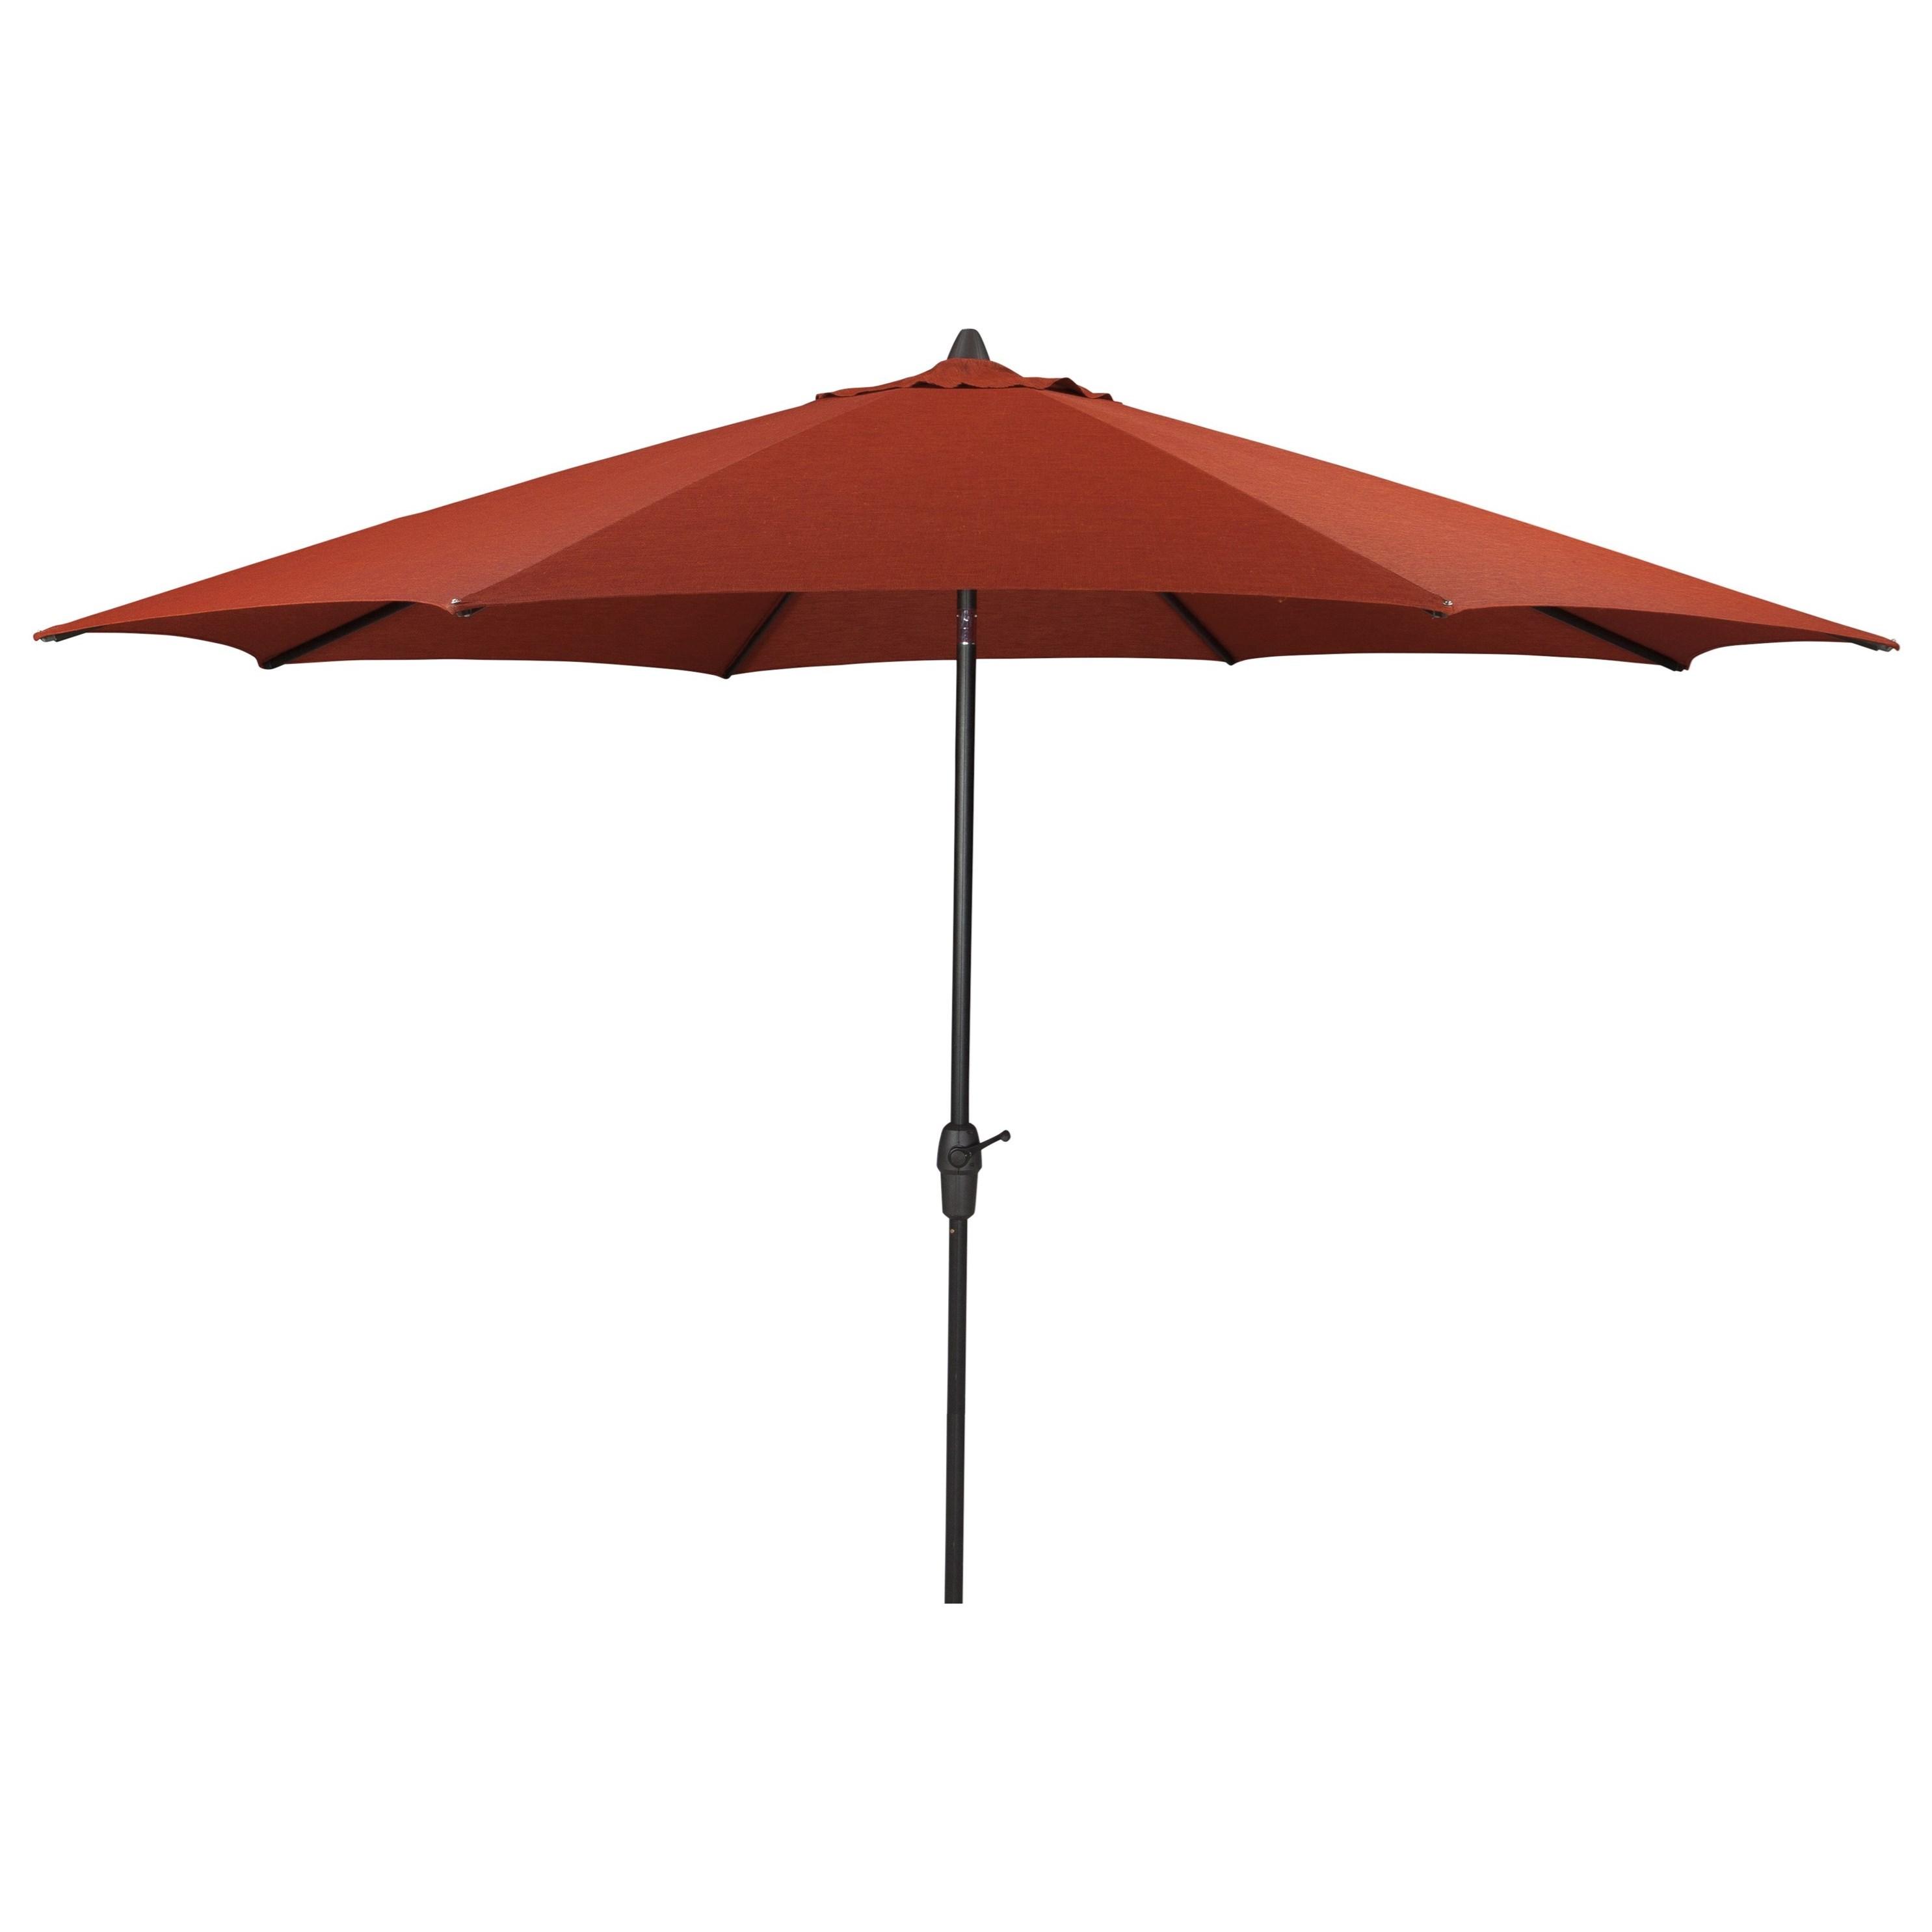 Ashley signature design umbrella accessories large auto for Architecture upbrella